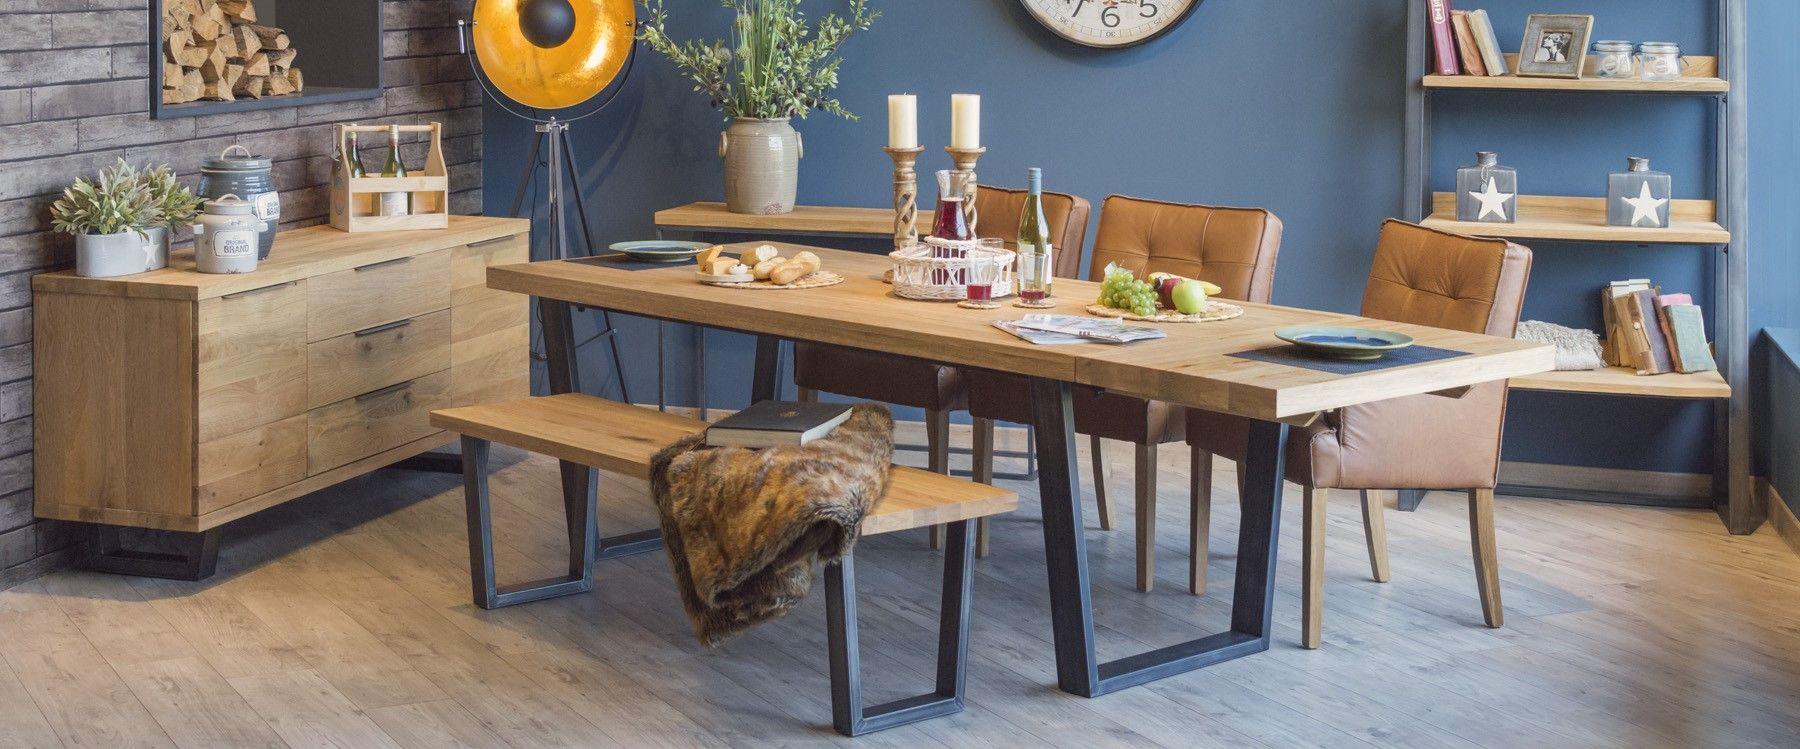 Calia Dining Table Ez Living Furniture Dublin Cork